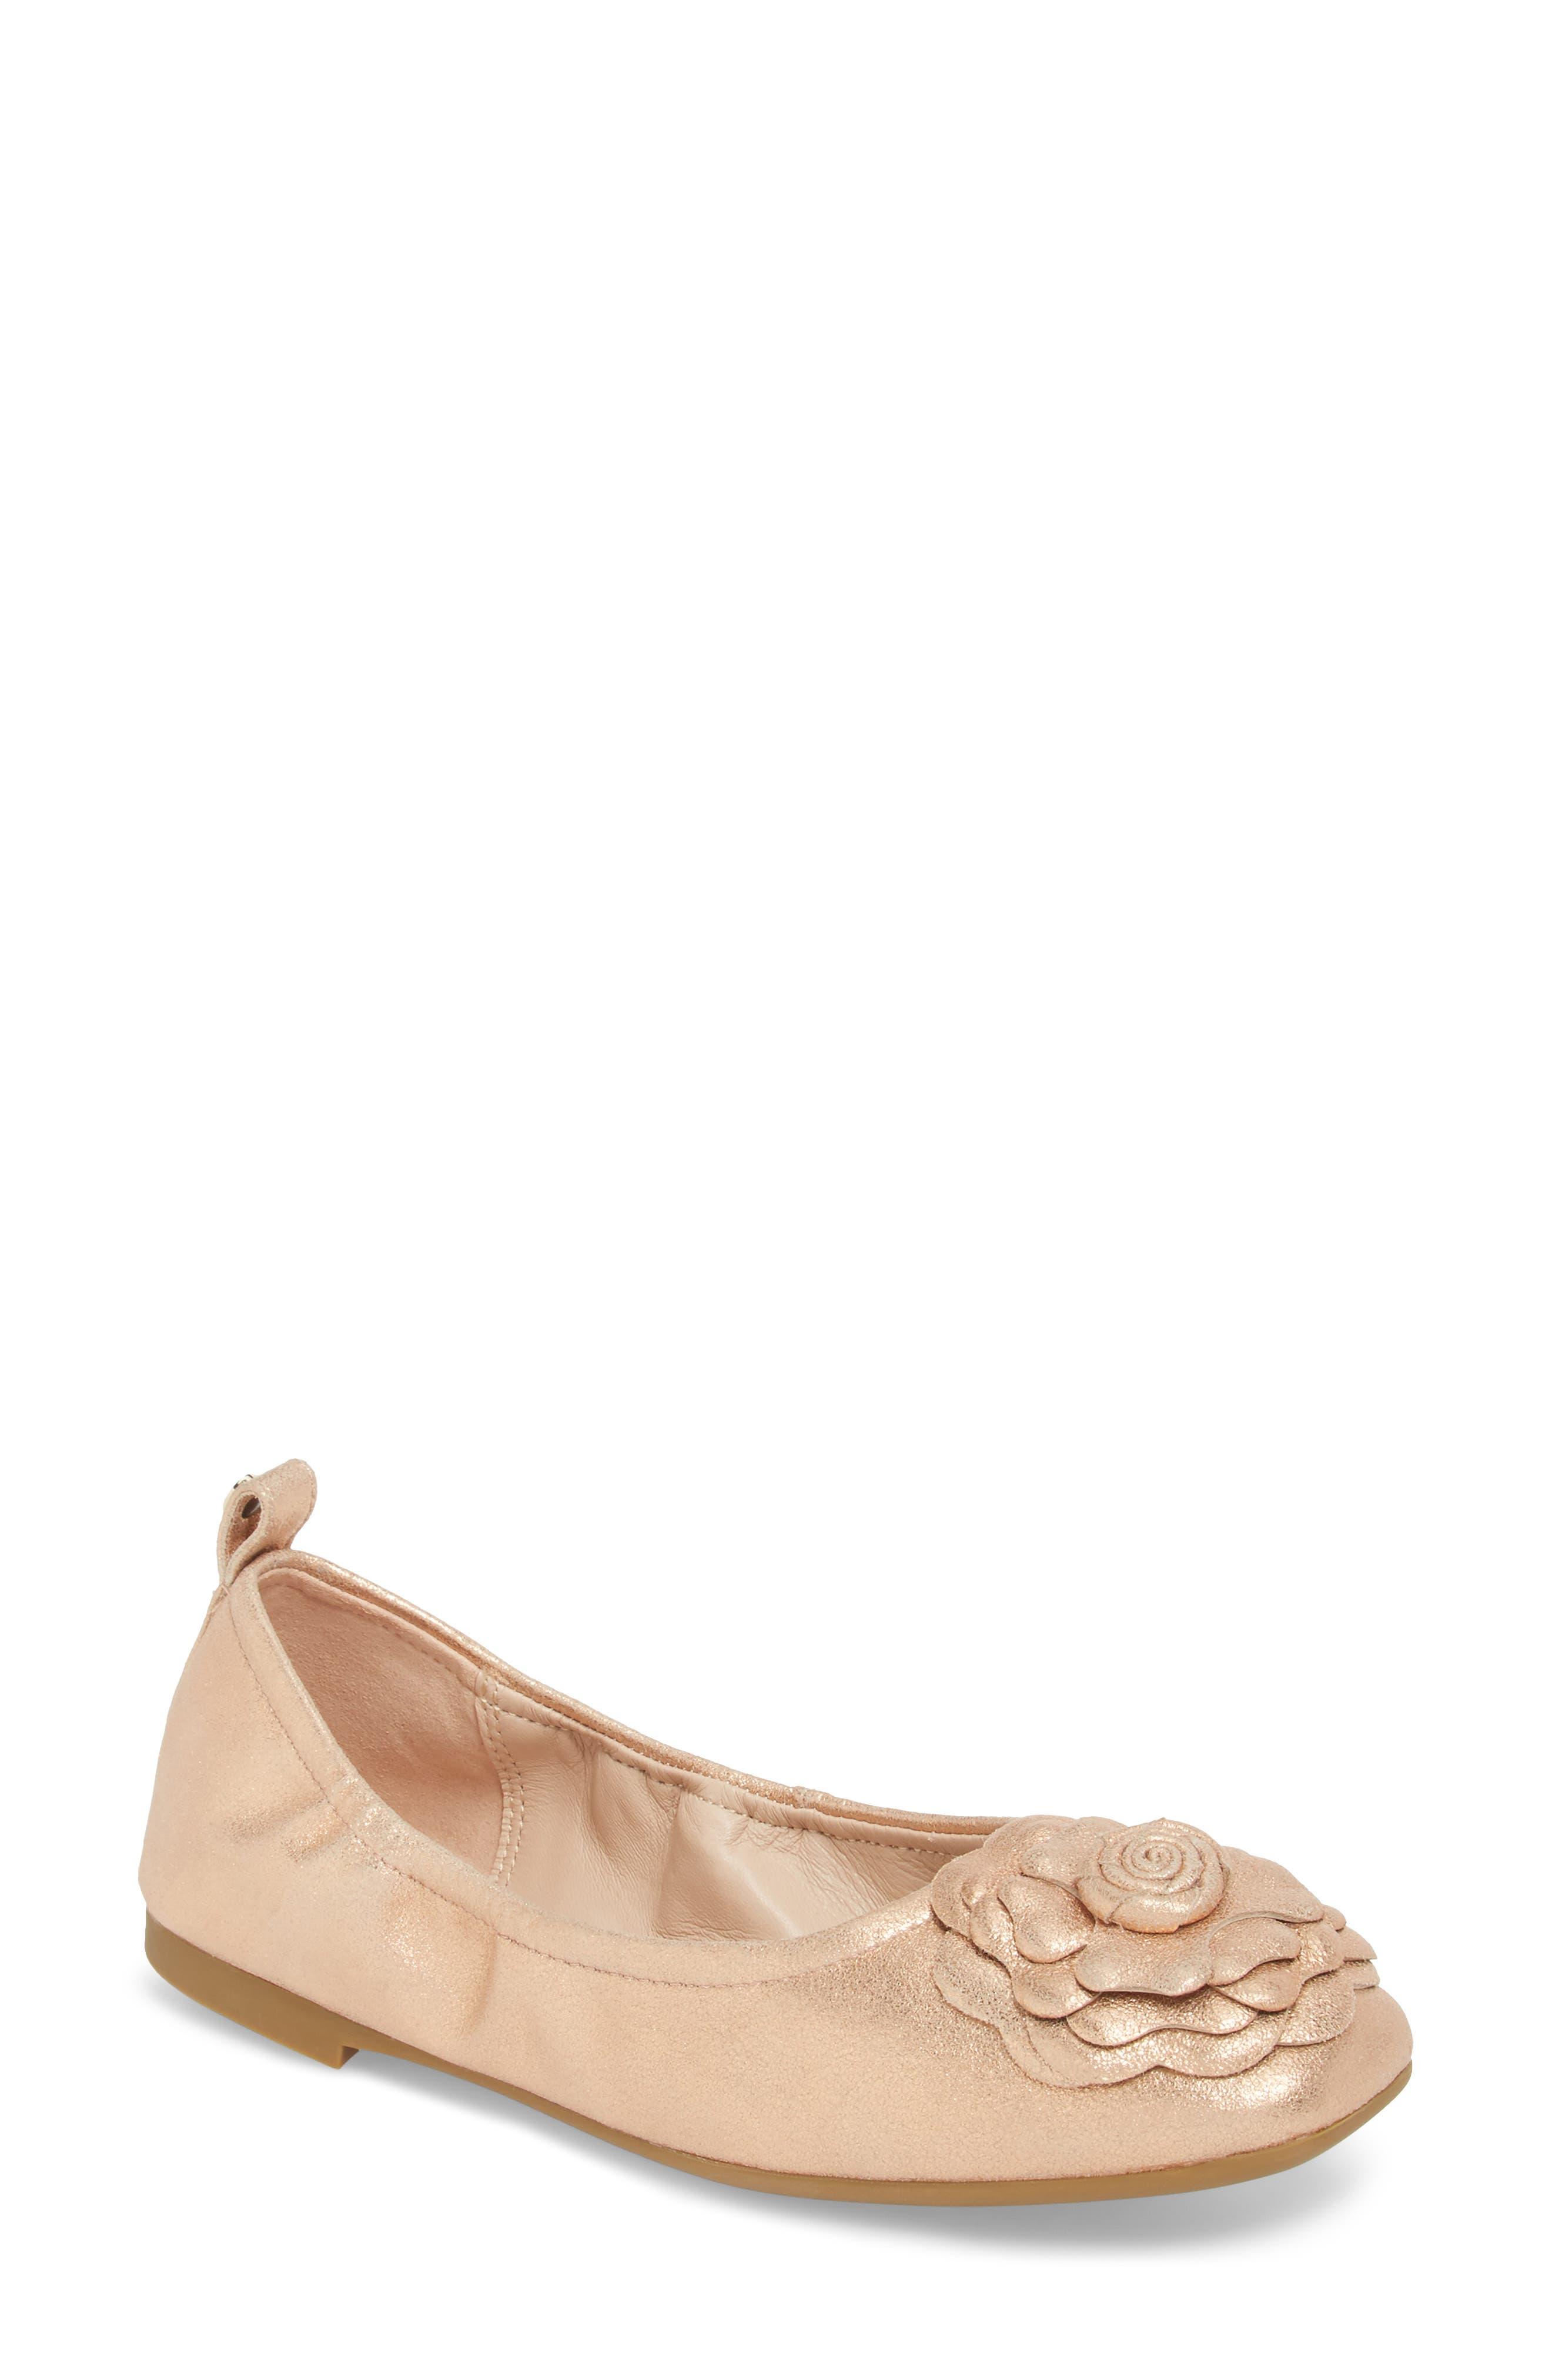 Rosalyn Ballet Flat,                             Main thumbnail 1, color,                             Rose Gold Leather